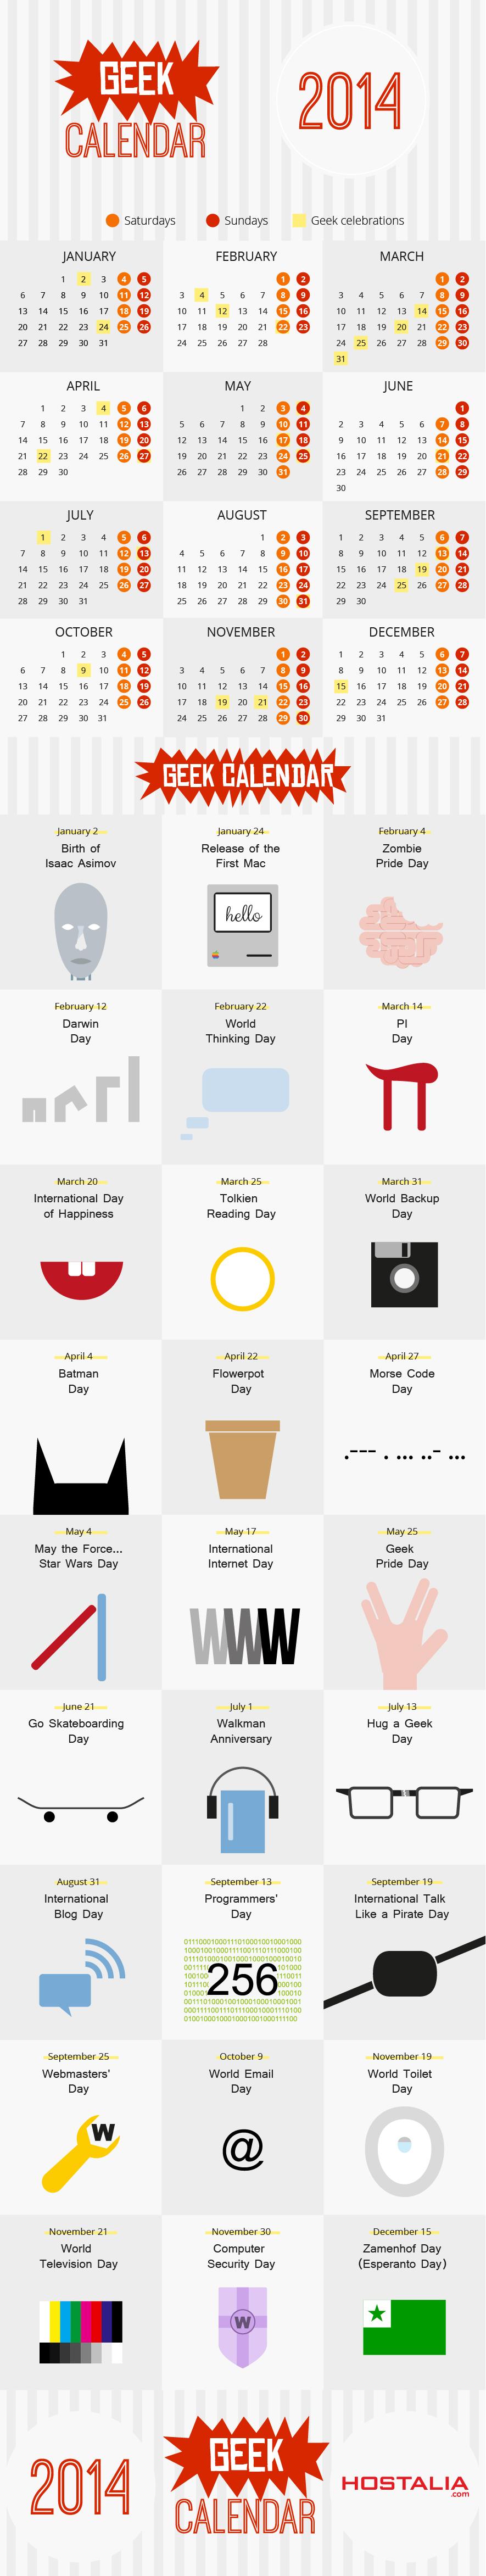 geek-calendar-2014-english